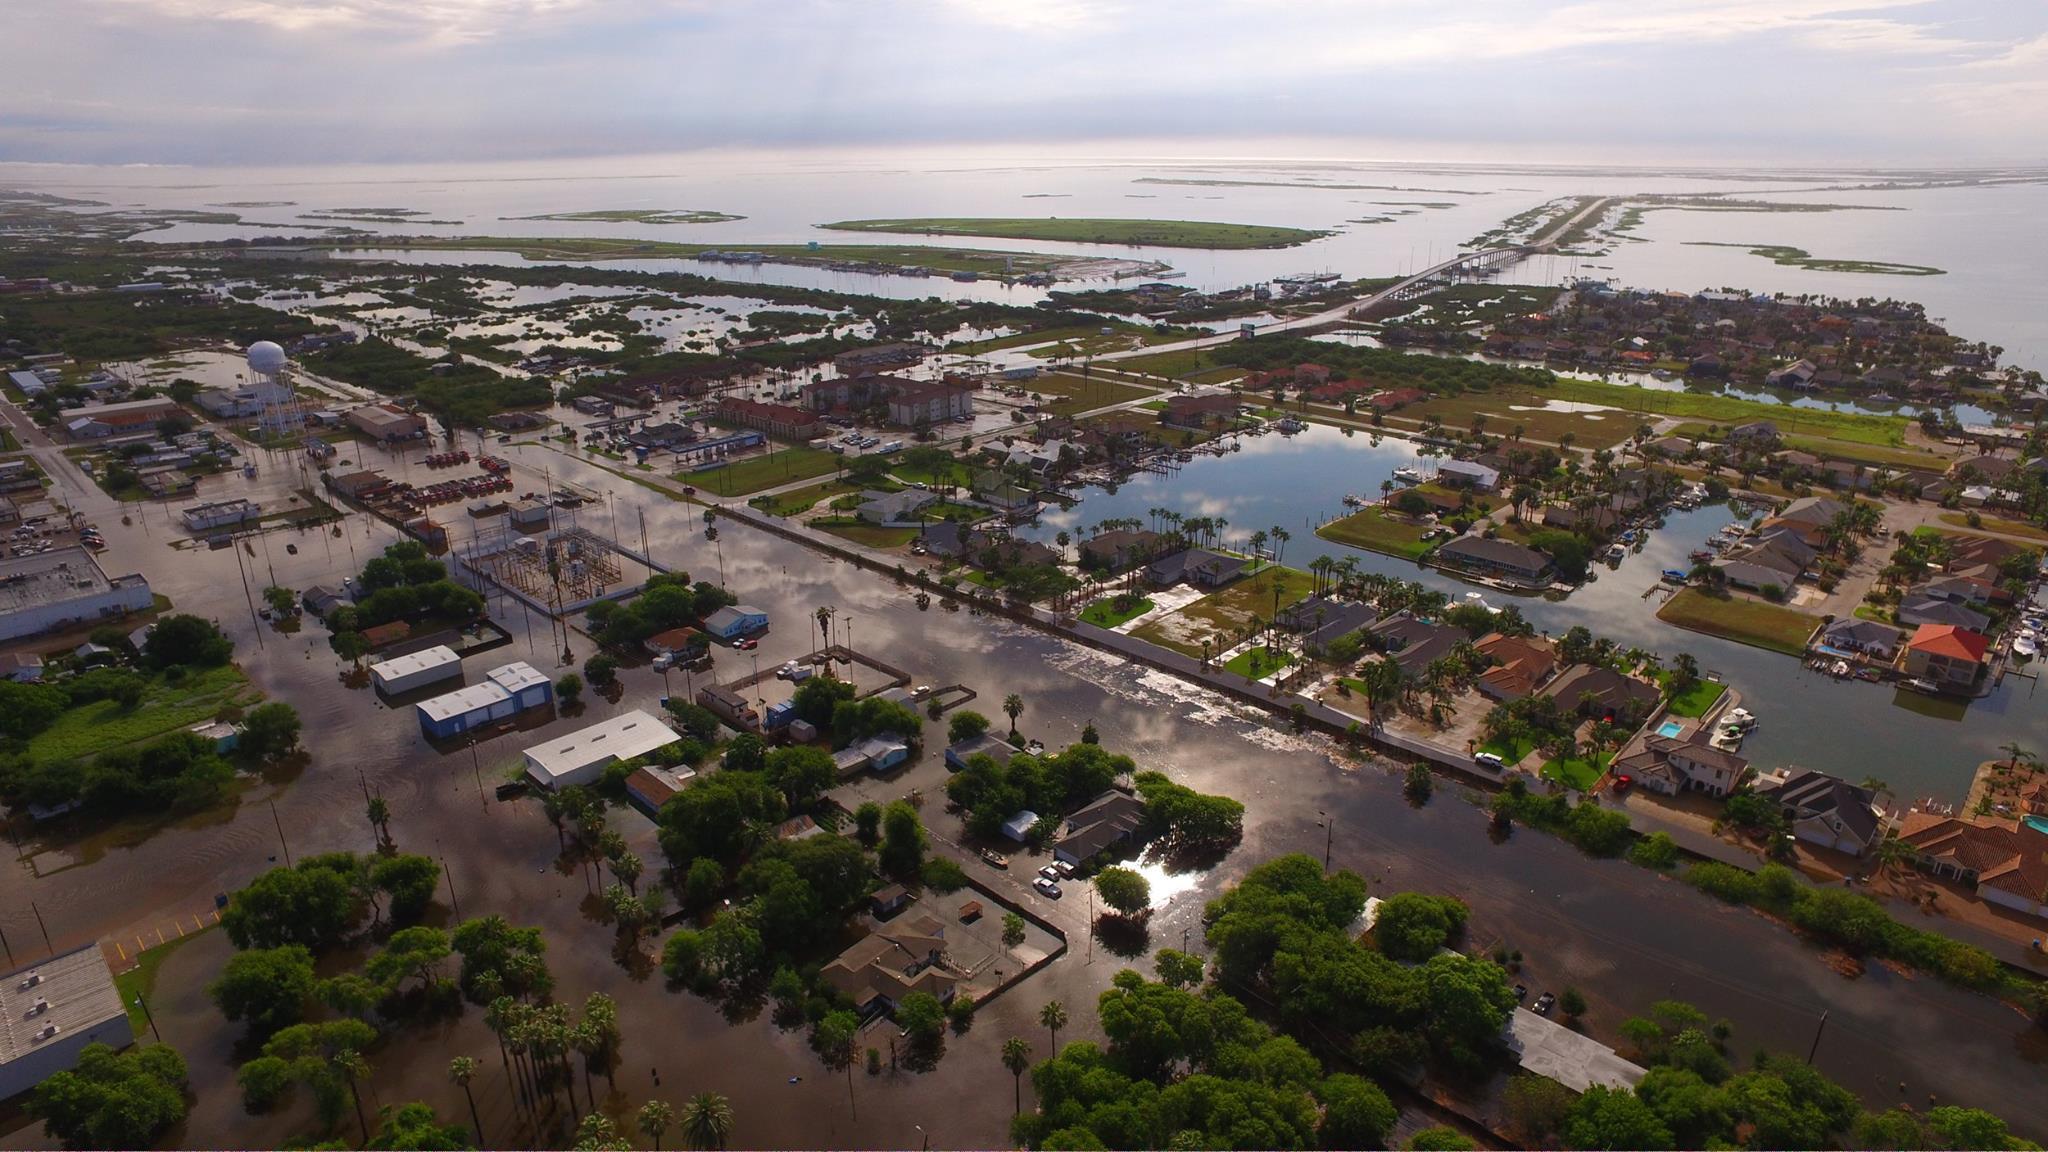 Photographs show Texas harbor city Aransas Pass flooded